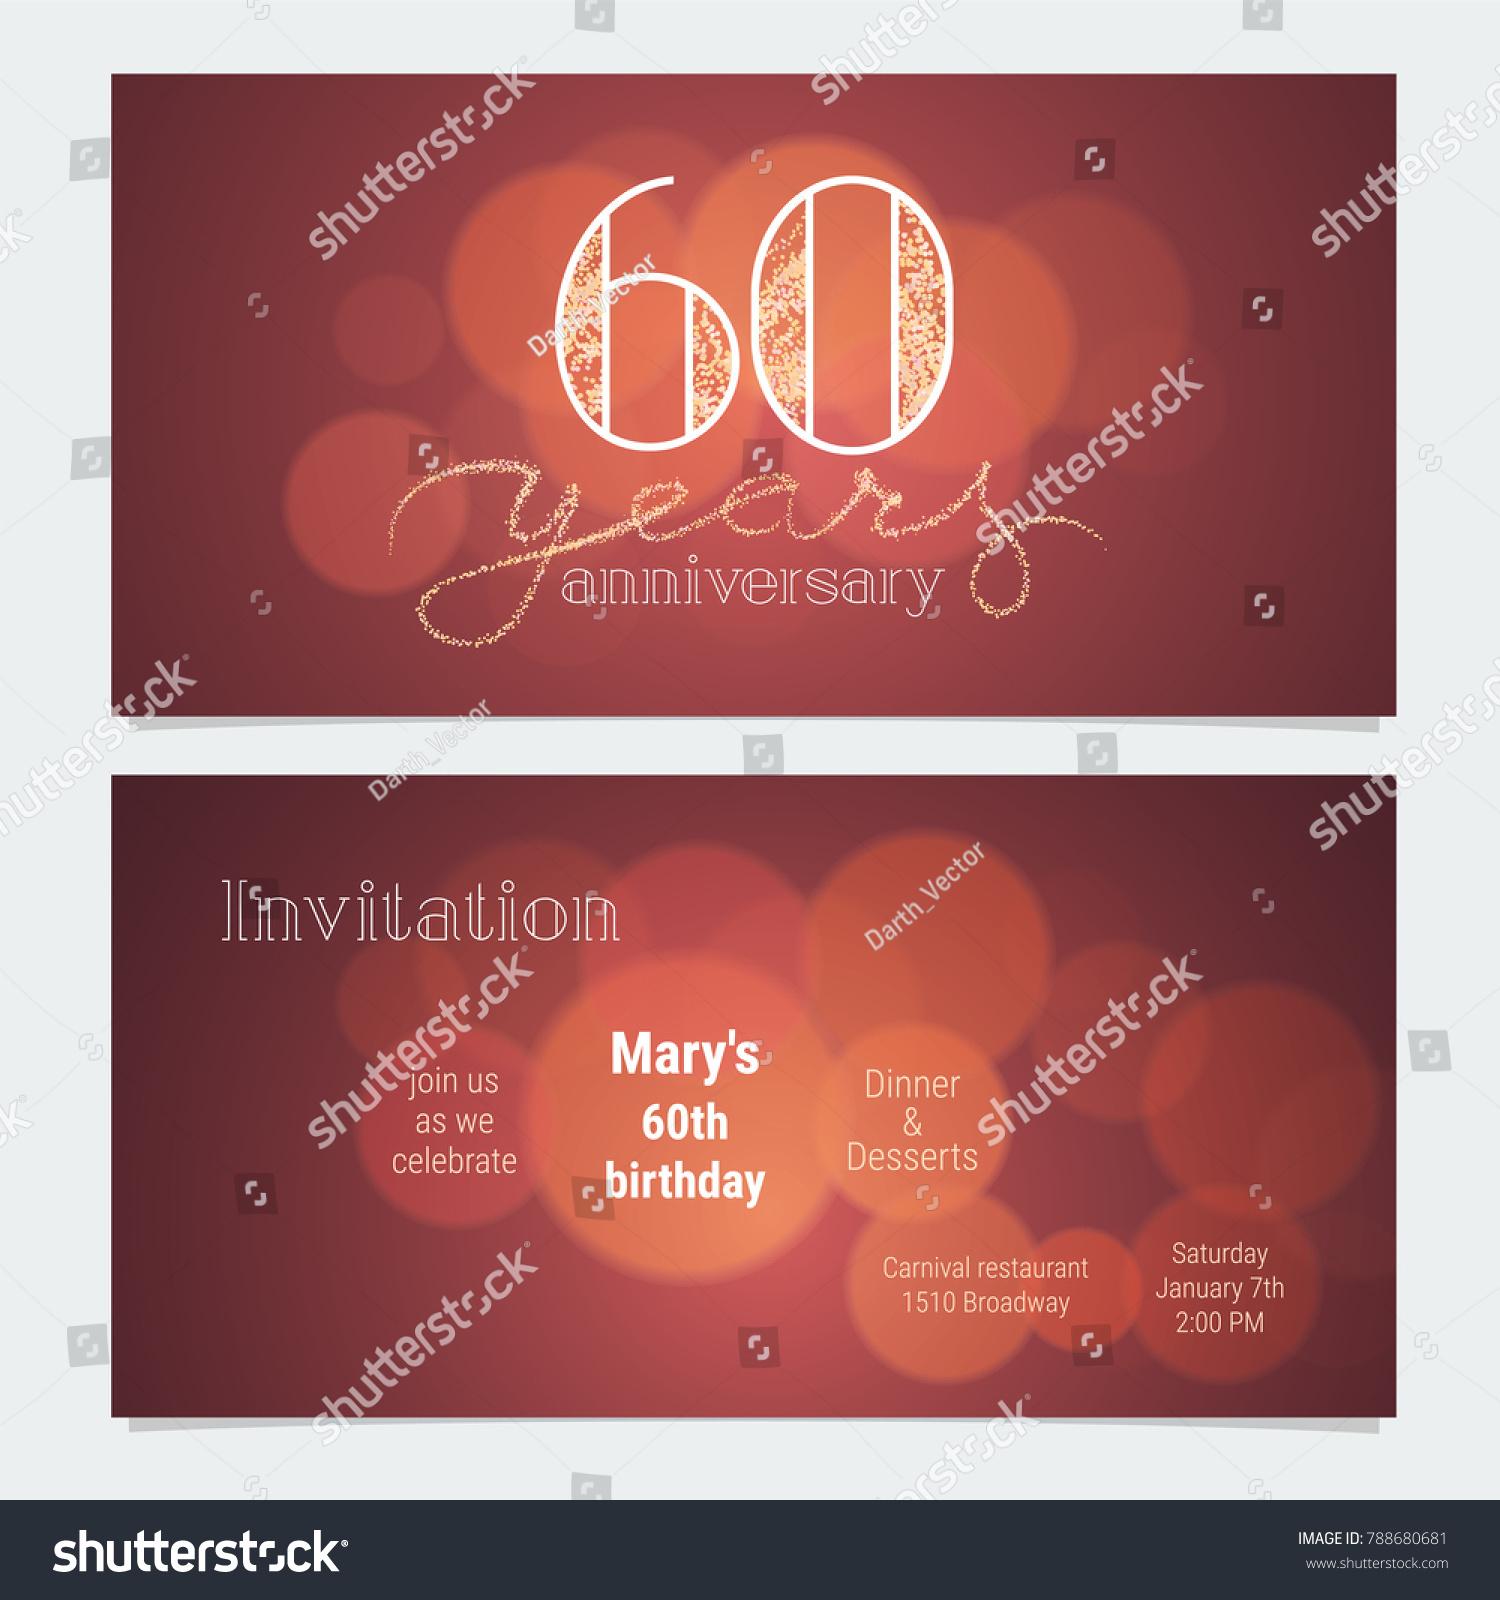 60 Years Anniversary Invitation Celebration Vector Stock Vector ...